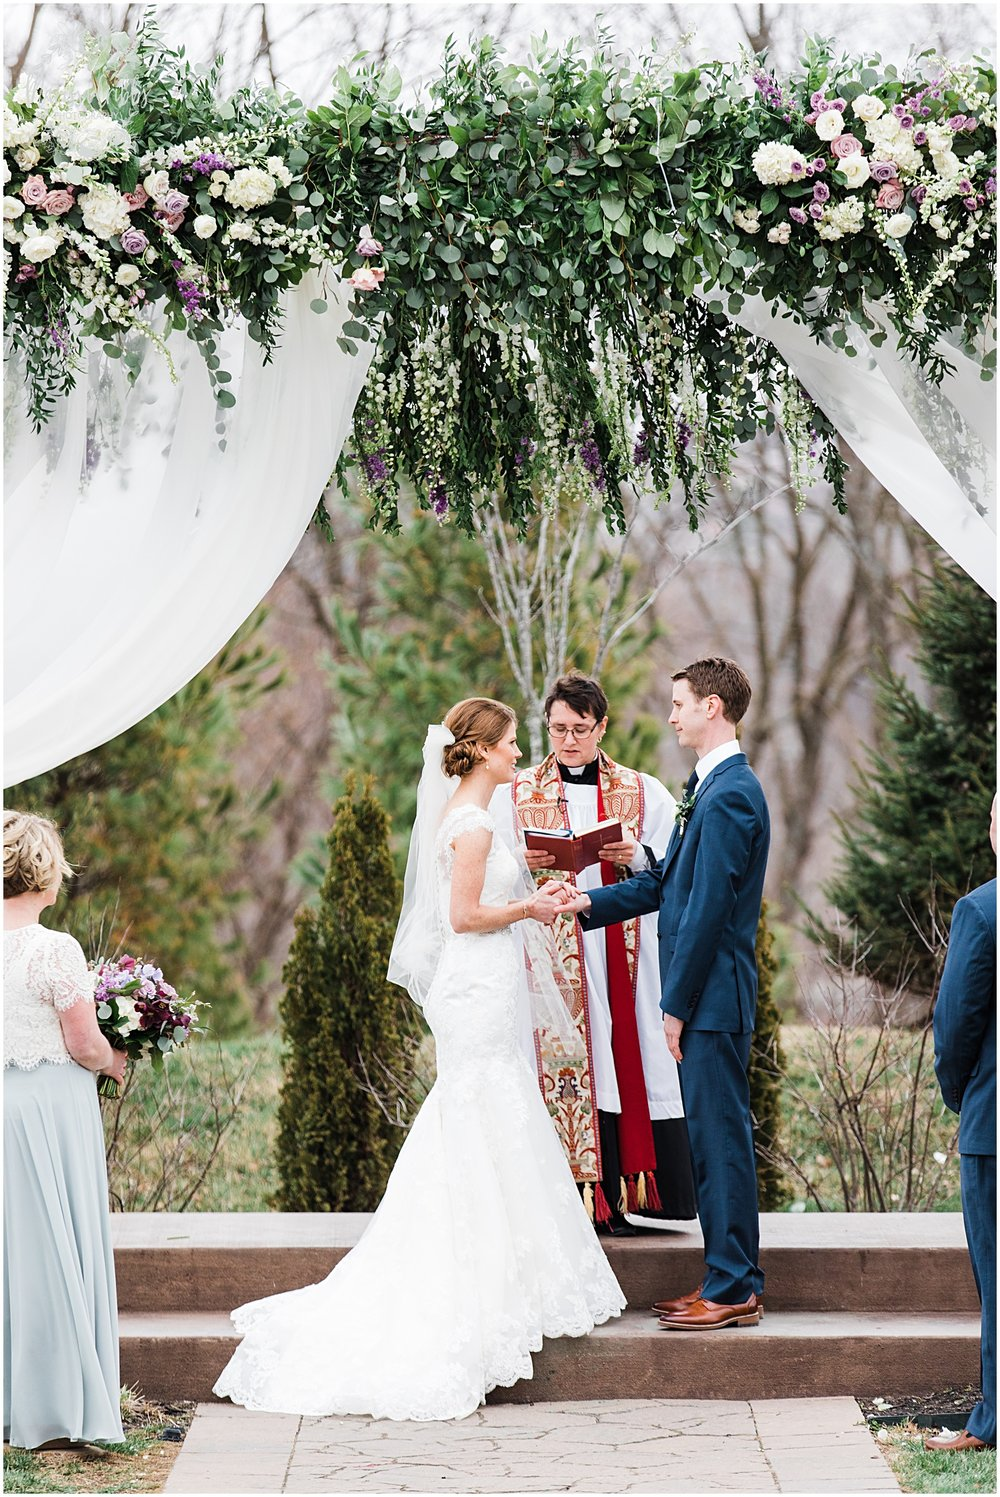 JACOBI WEDDING | 1890 EVENT SPACE | MARISSA CRIBBS PHOTOGRAPHY_4320.jpg